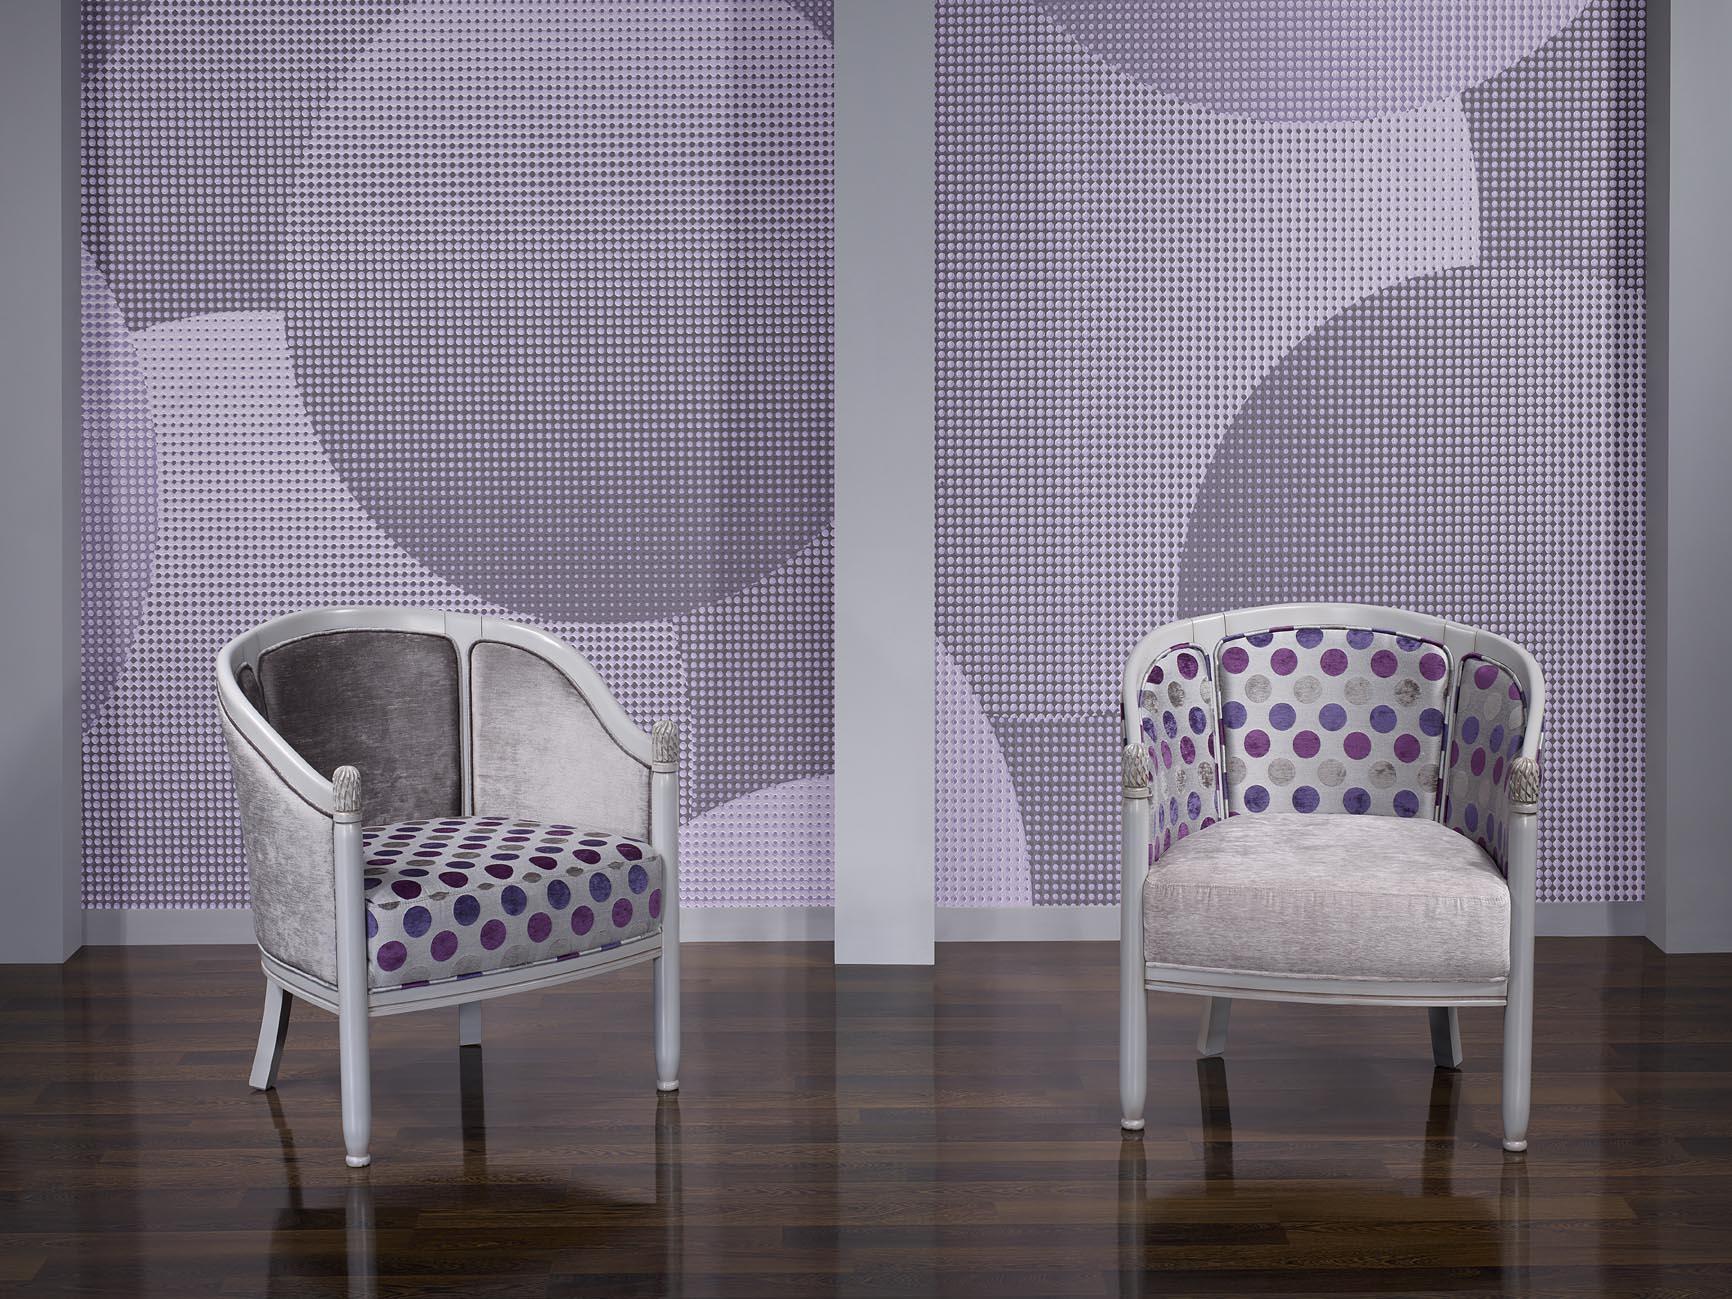 fauteuil cabriolet elena en h tre massif de style louis. Black Bedroom Furniture Sets. Home Design Ideas